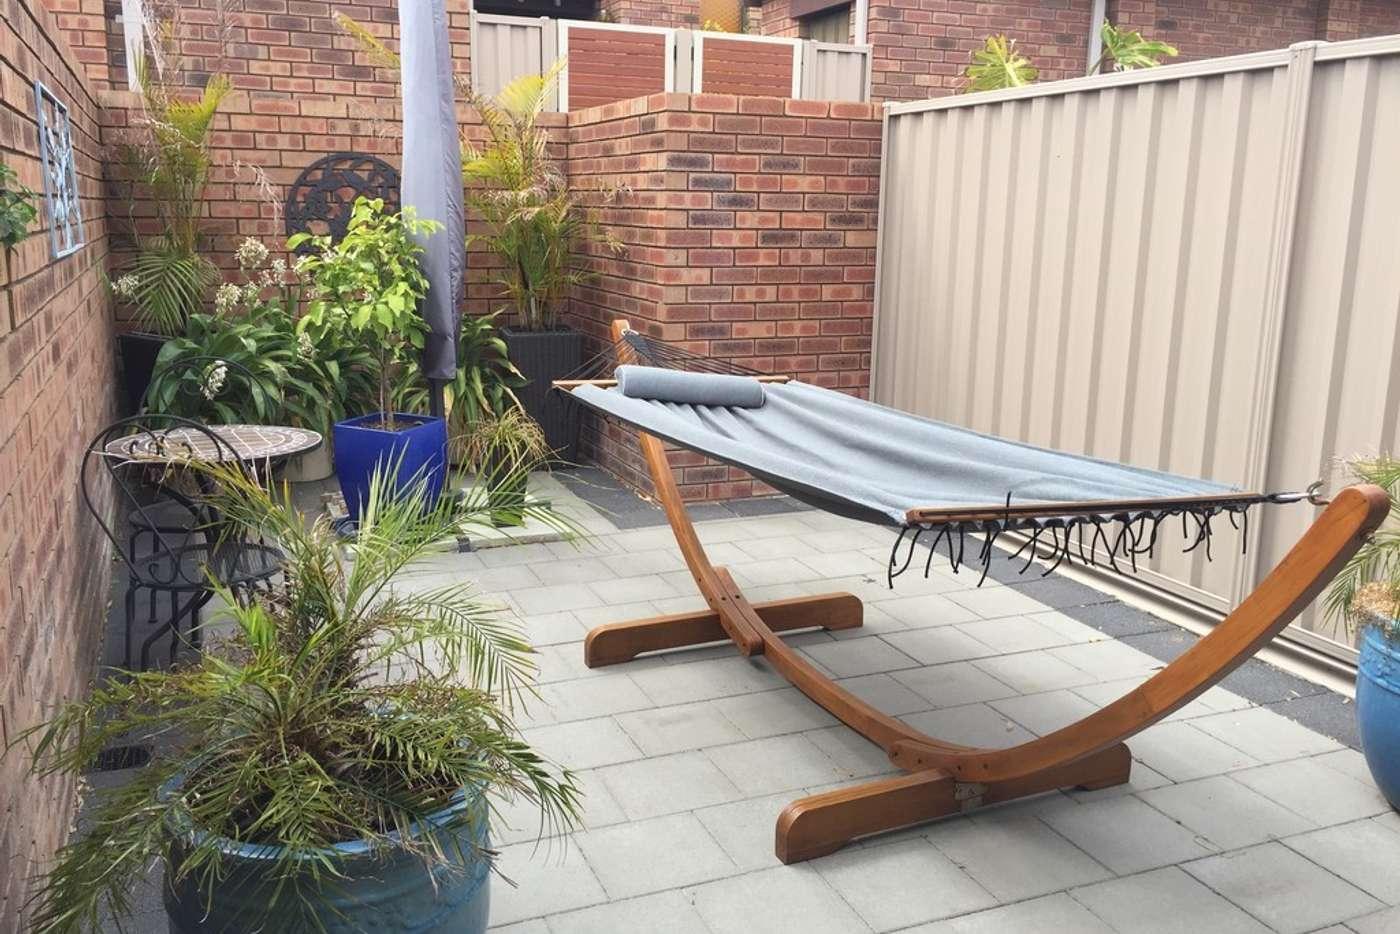 Main view of Homely villa listing, 8/228 Albert St, Osborne Park WA 6017